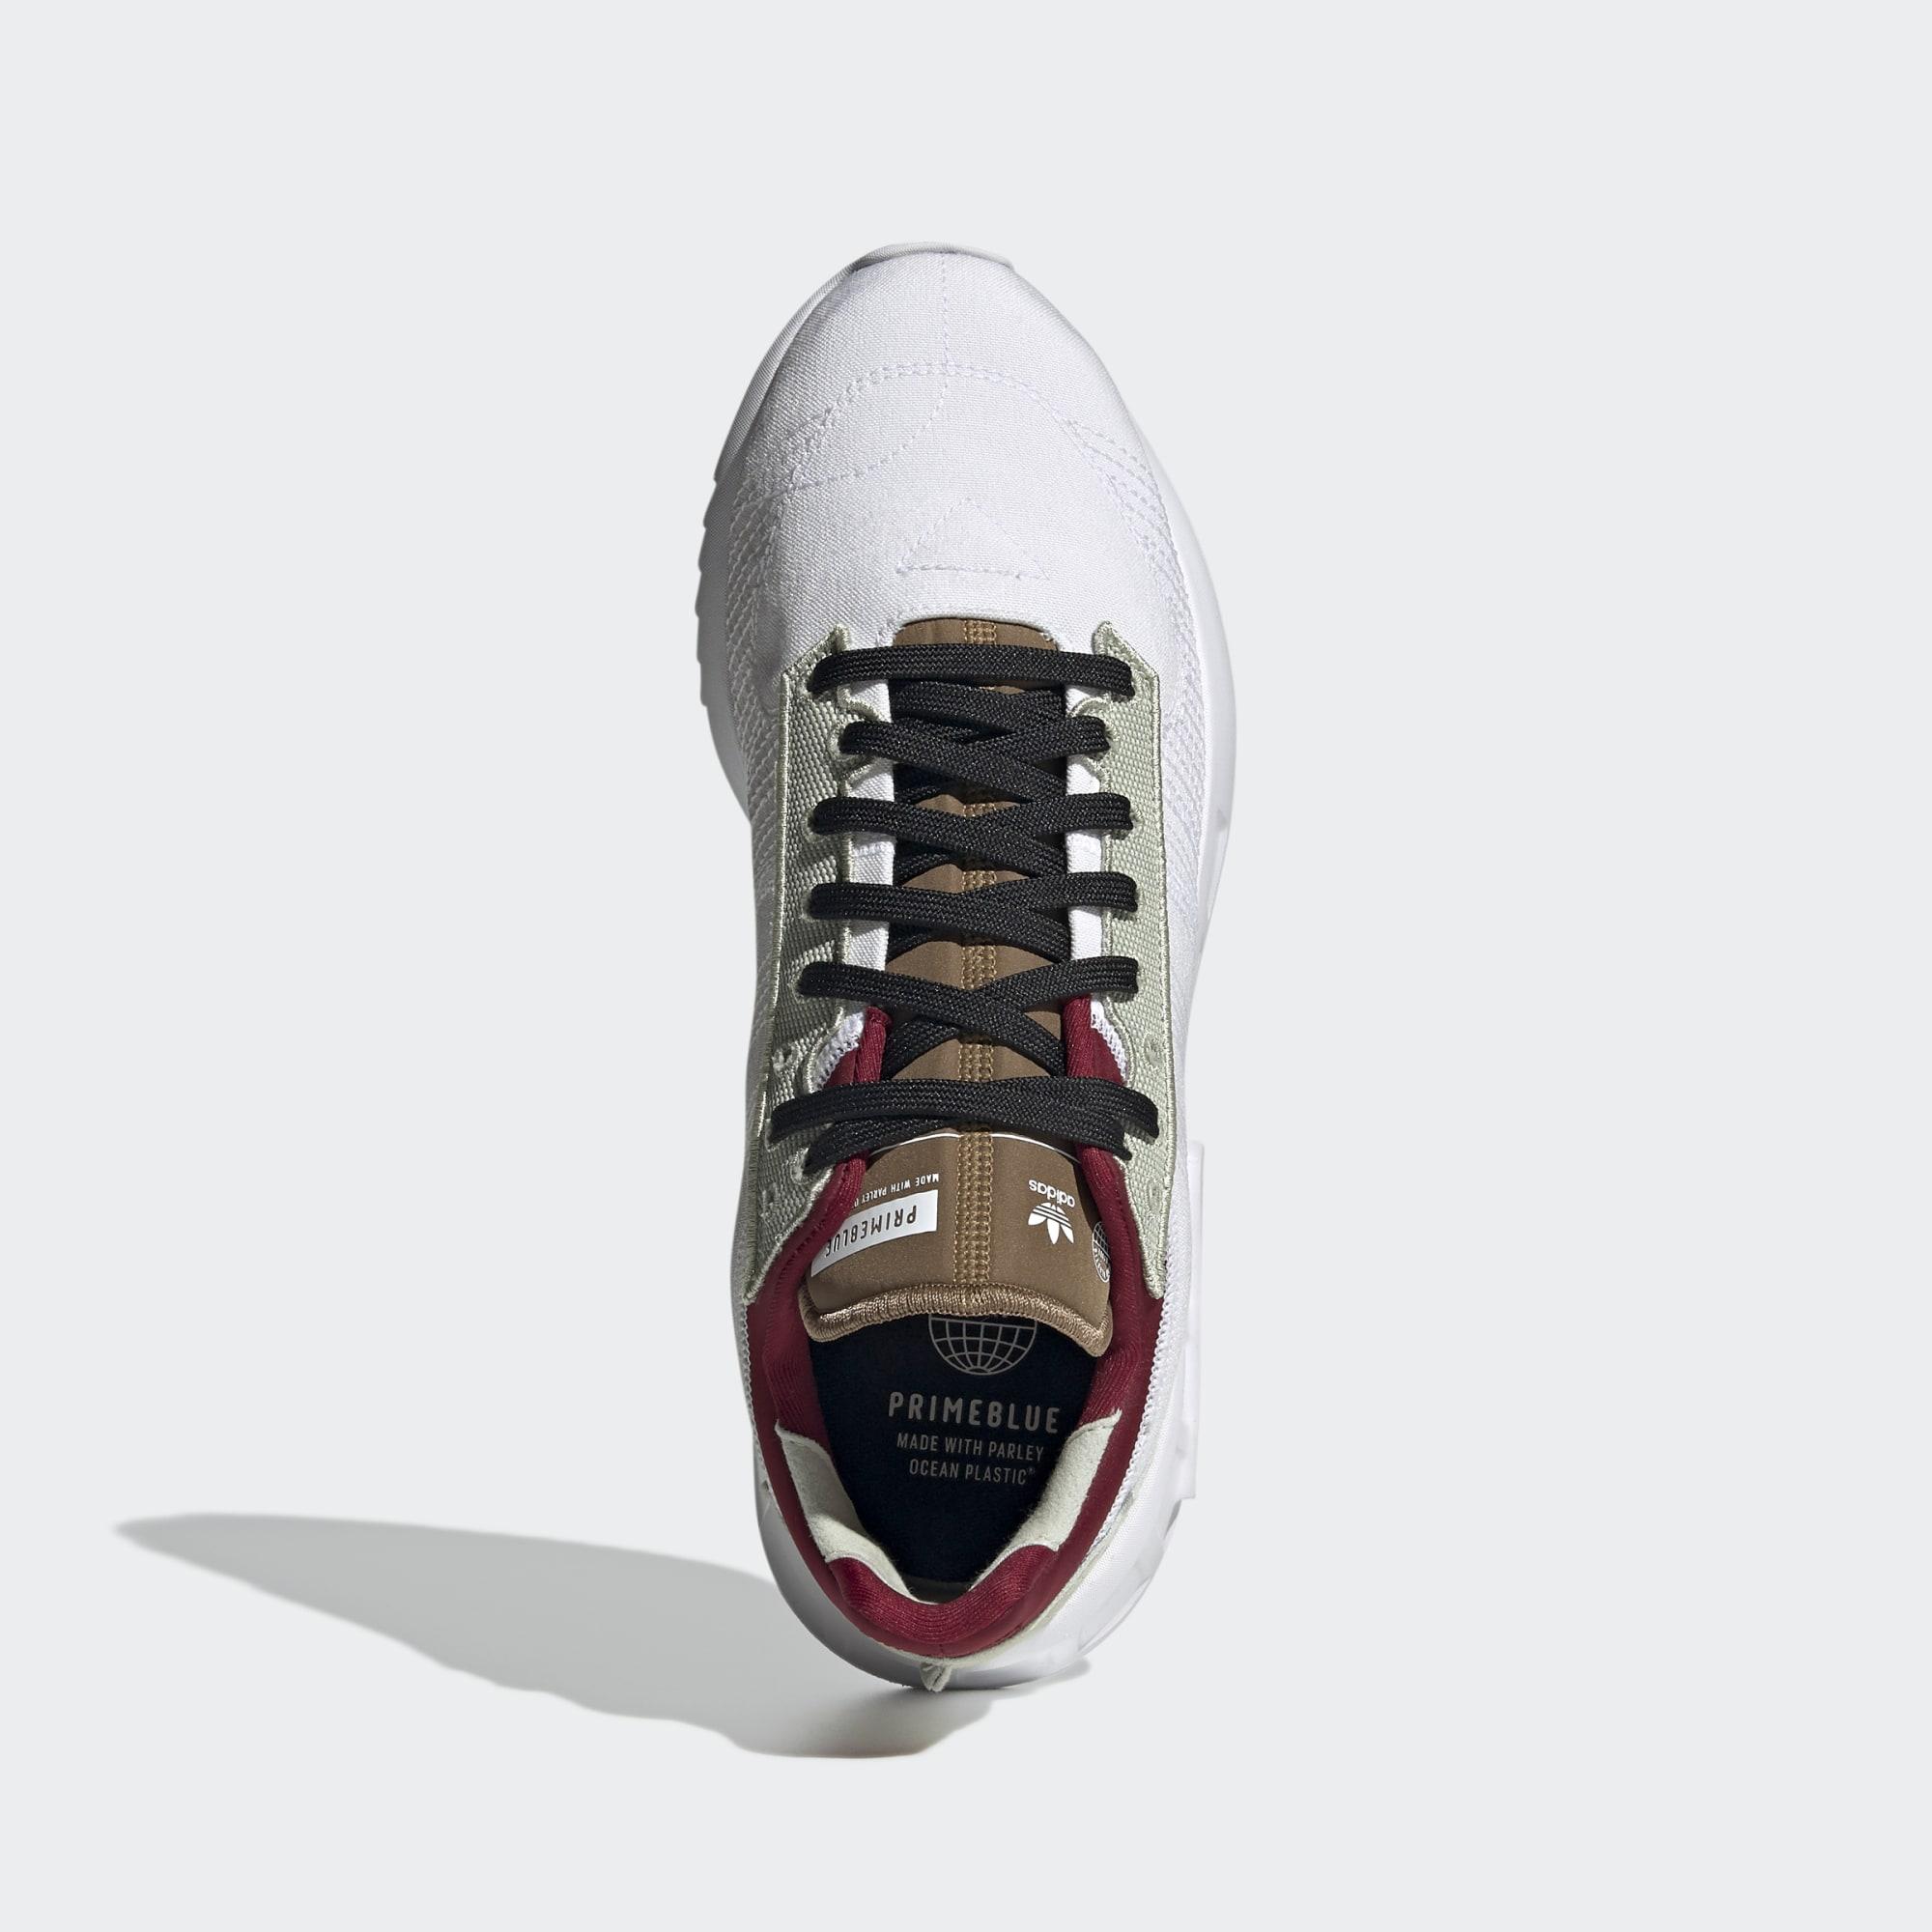 Geodiver_Primeblue_Shoes_White_FZ4687_02_standard.jpg